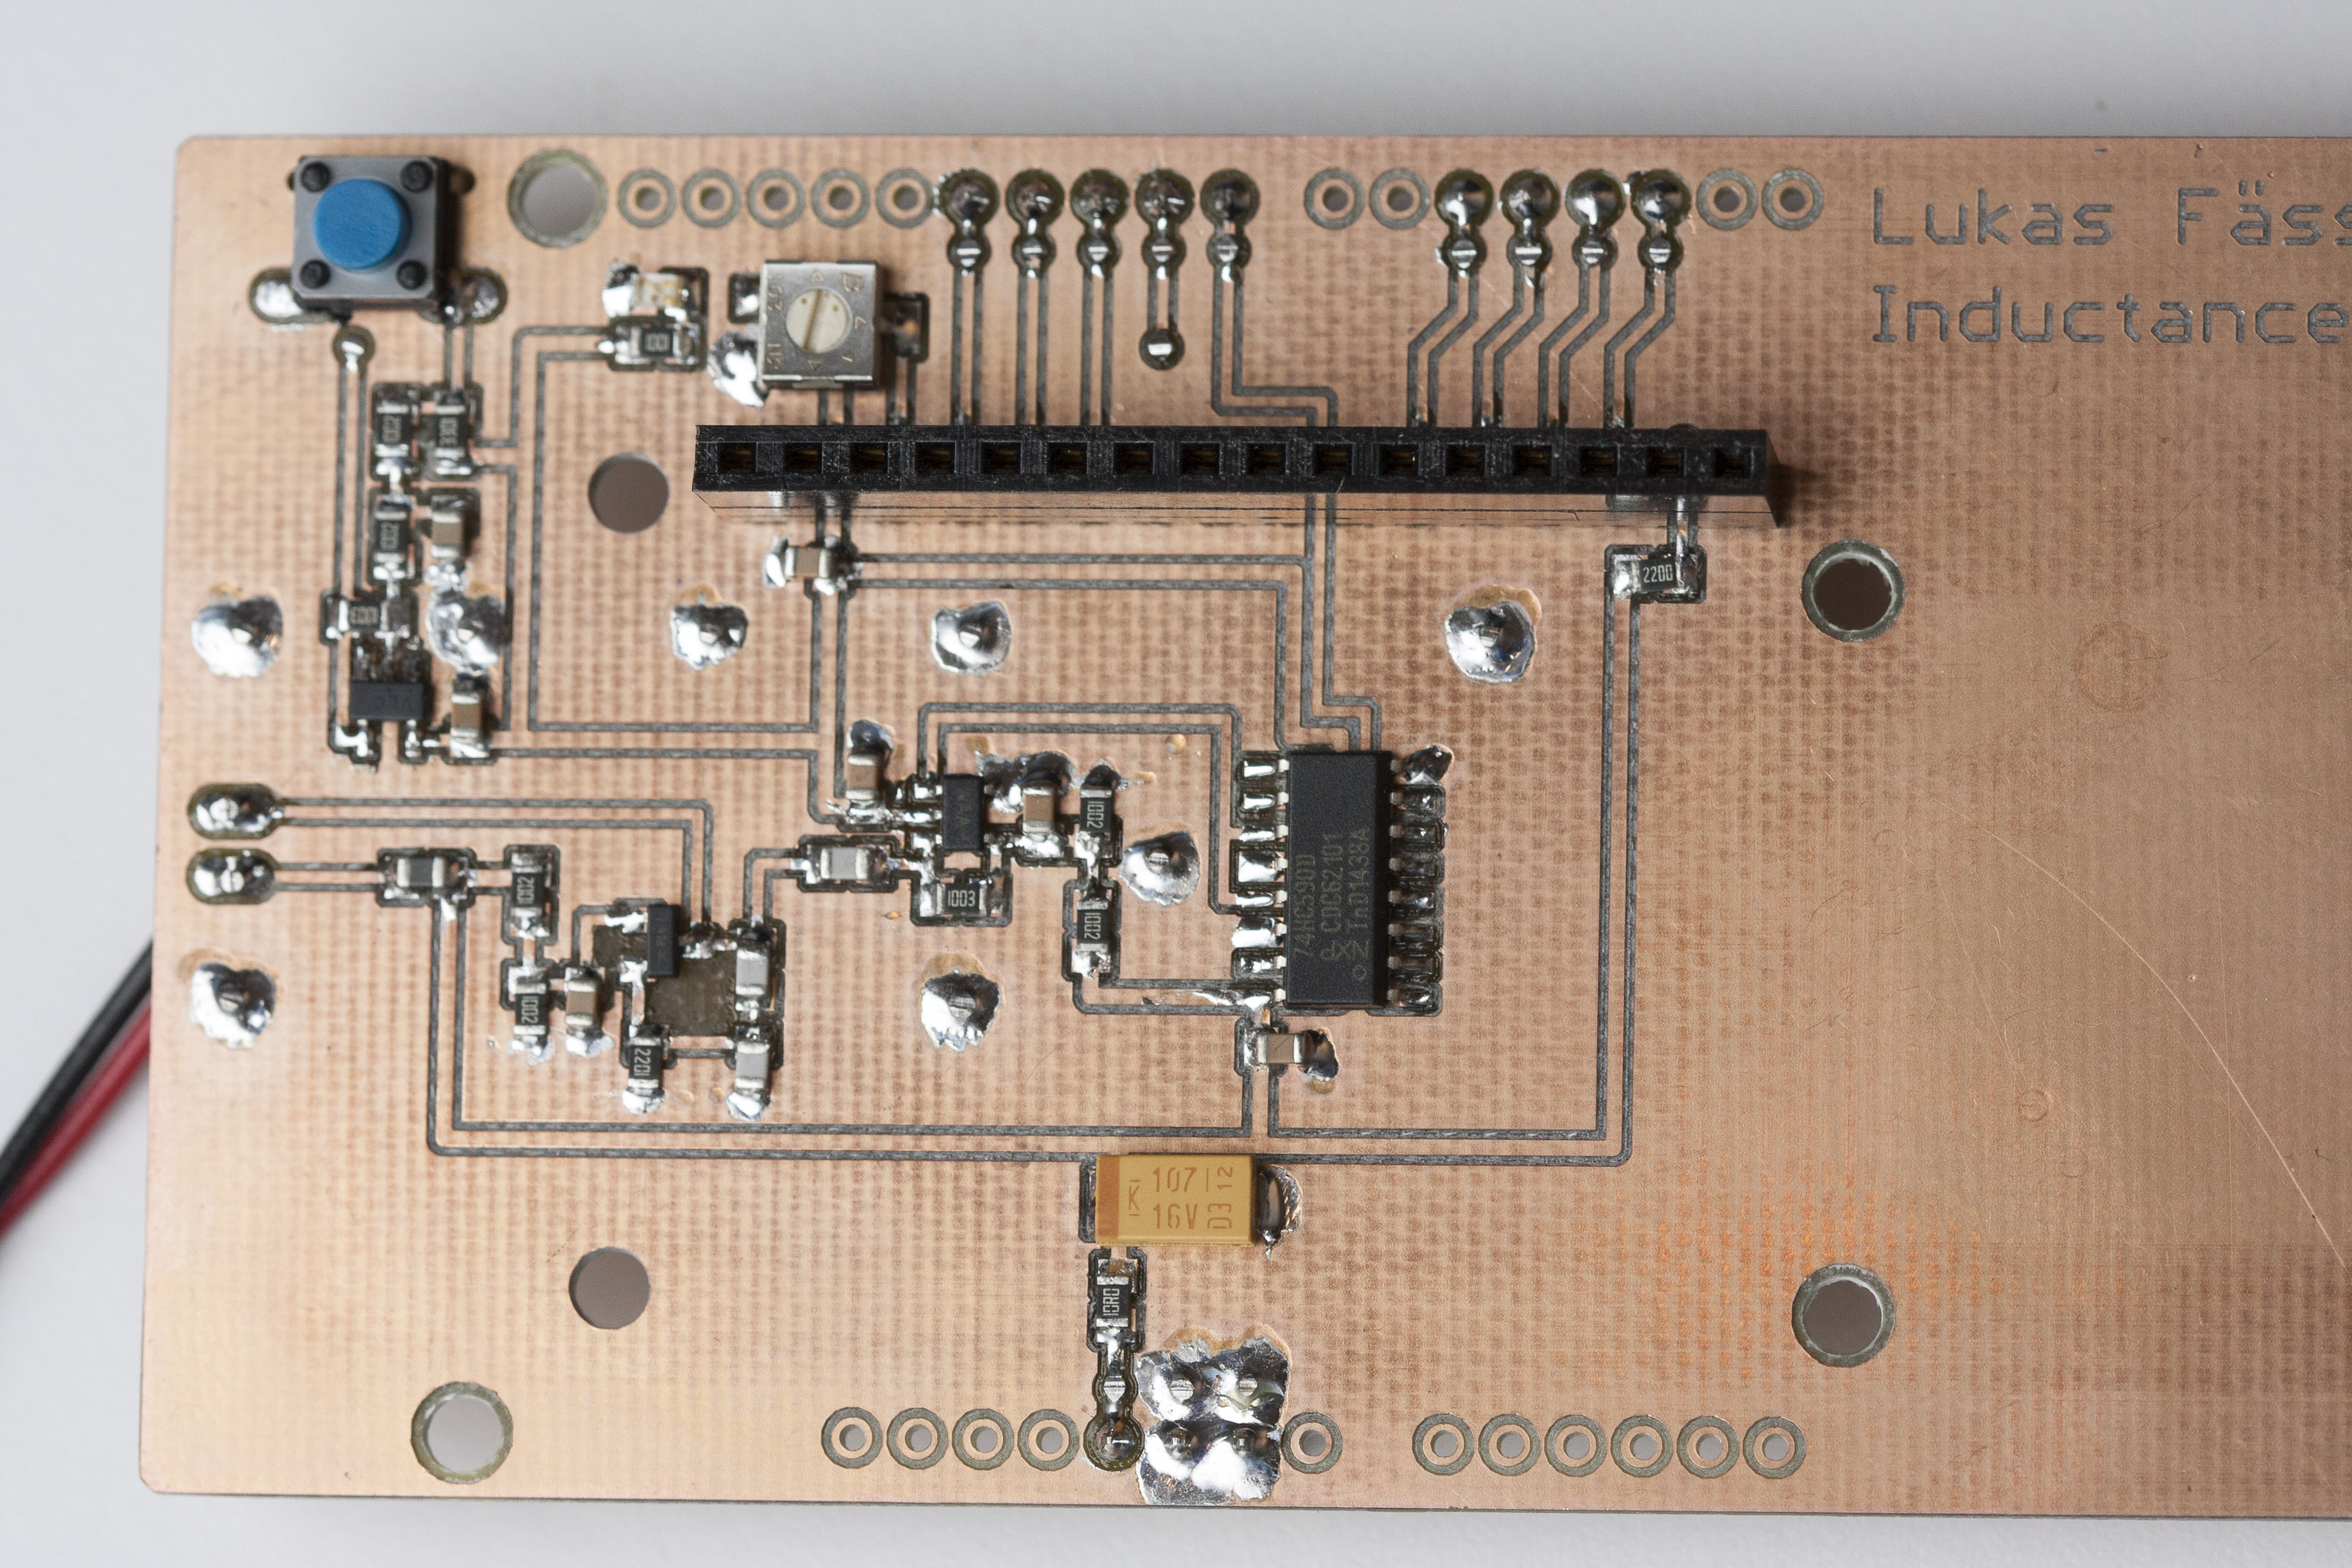 Inductor Coil Meter : Arduino based inductance meter soldernerd